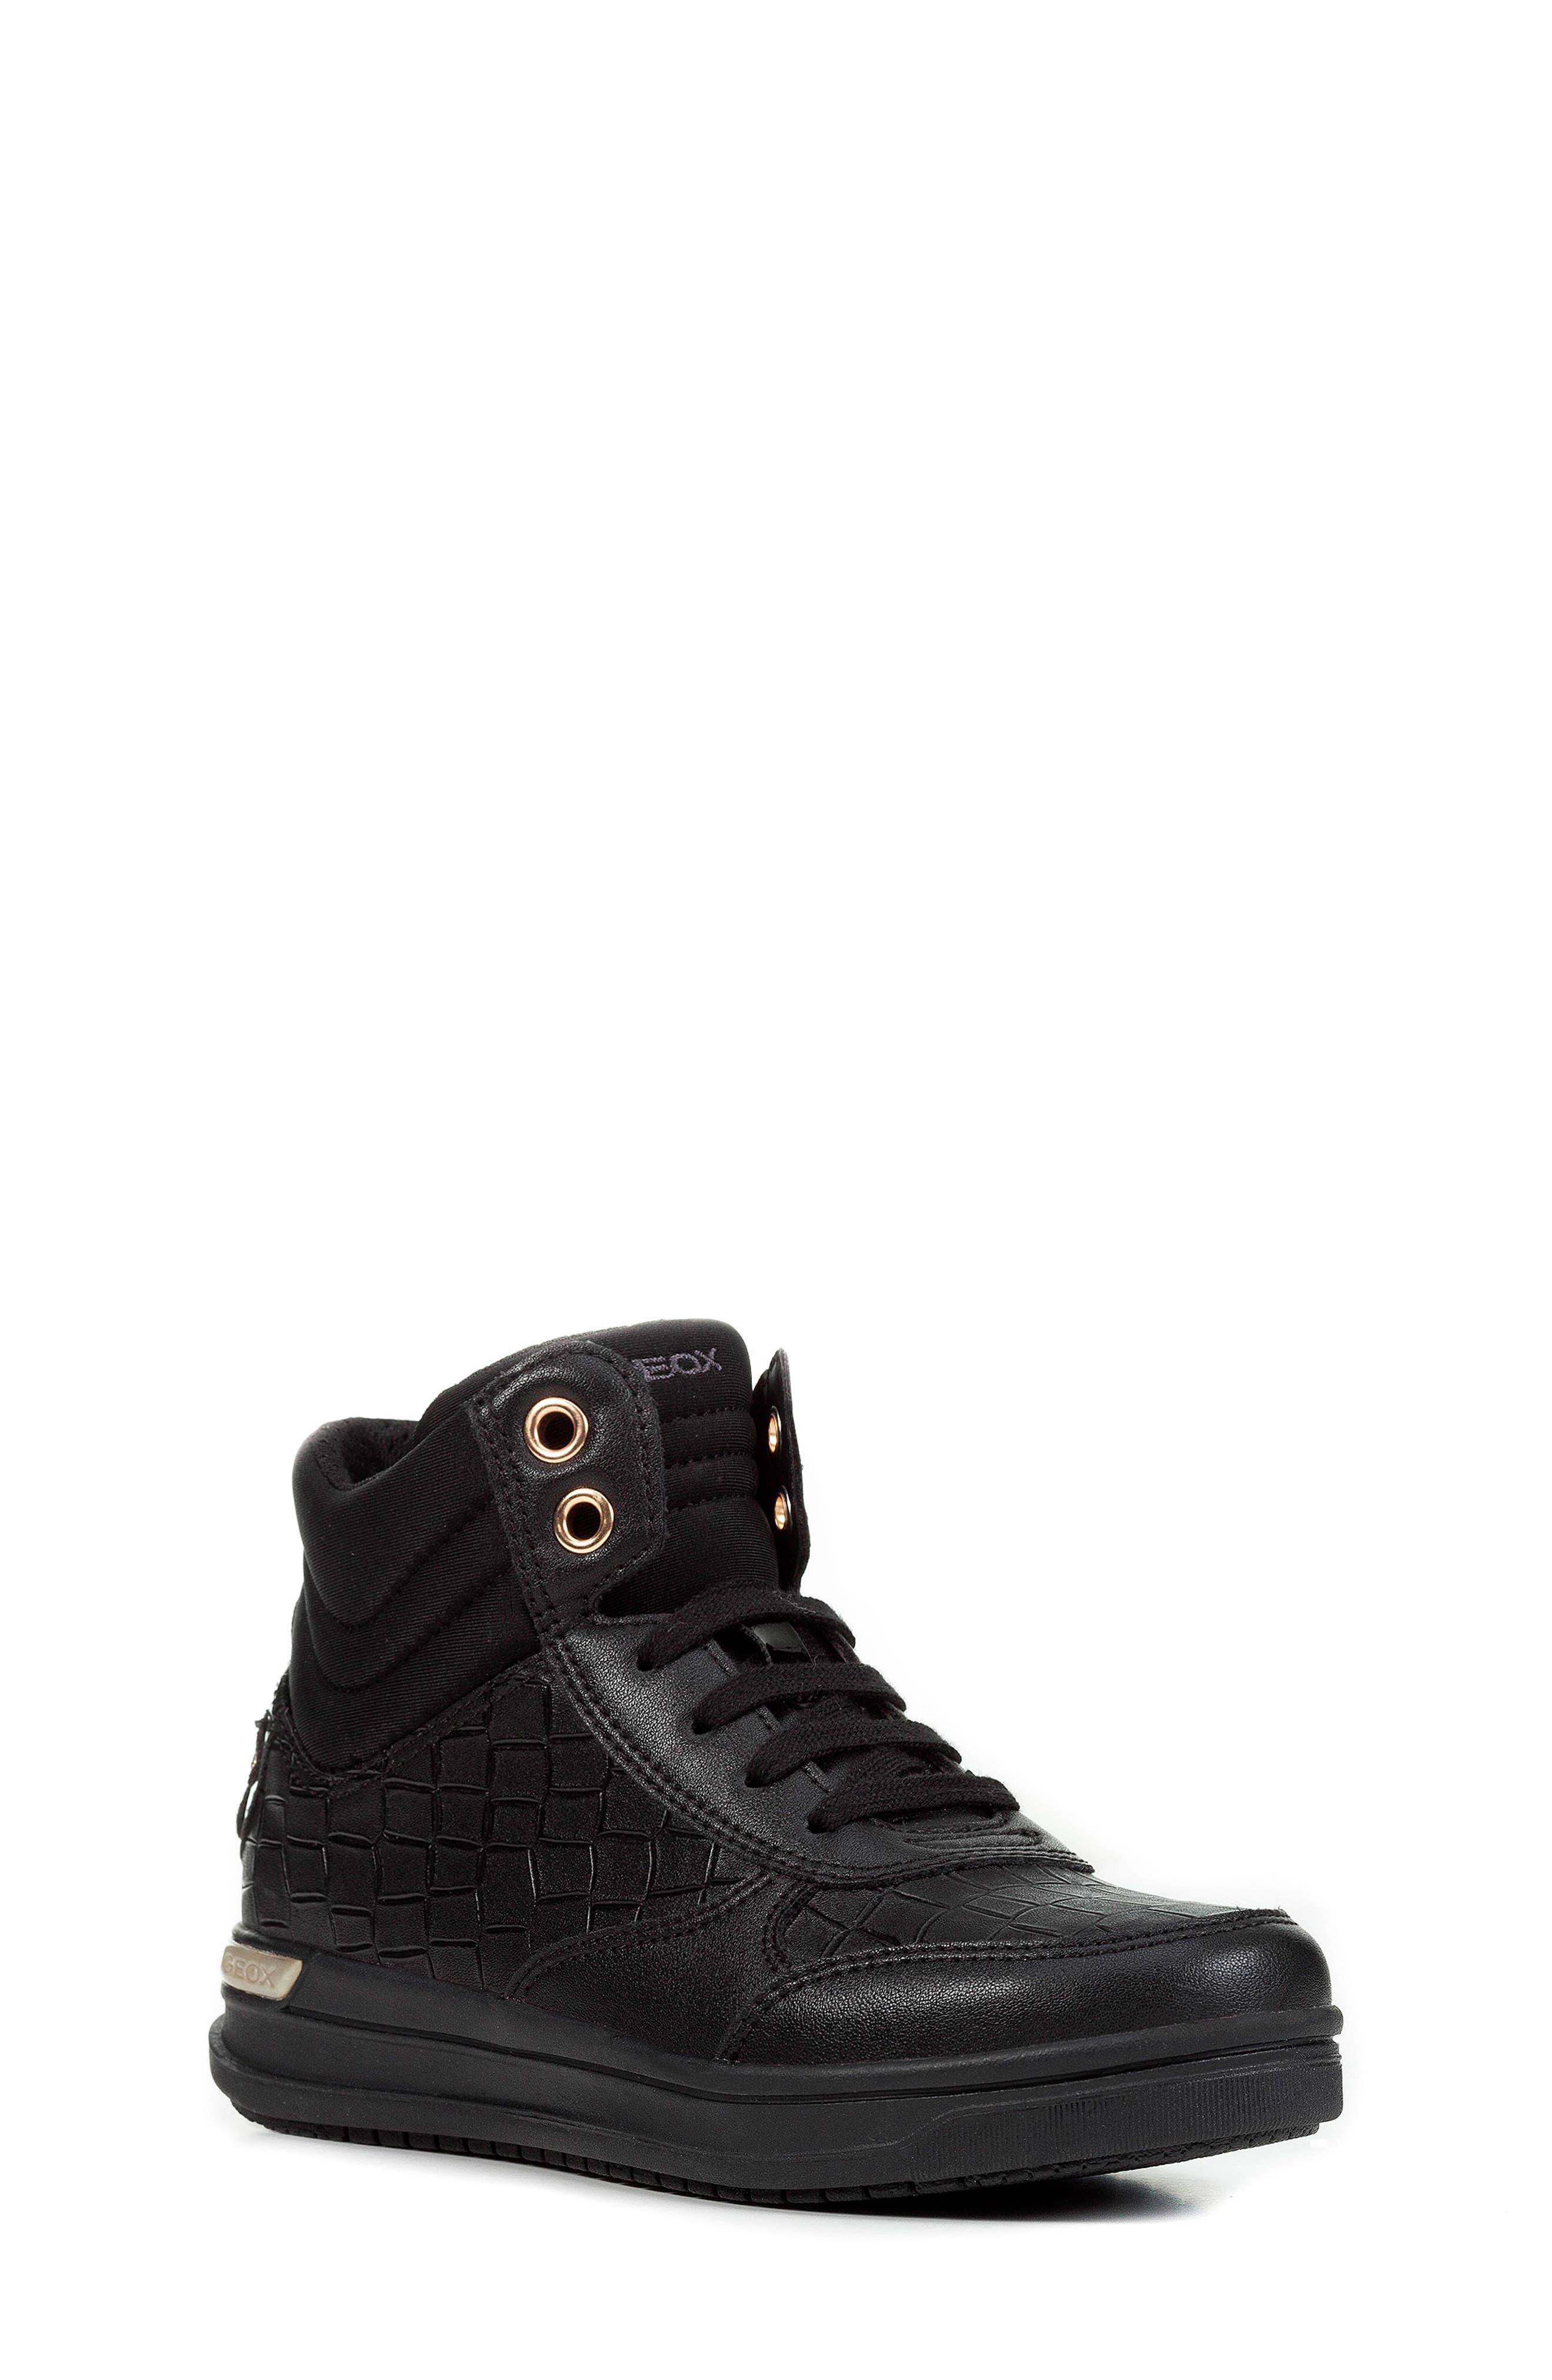 Aveup High Top Sneaker,                         Main,                         color, BLACK